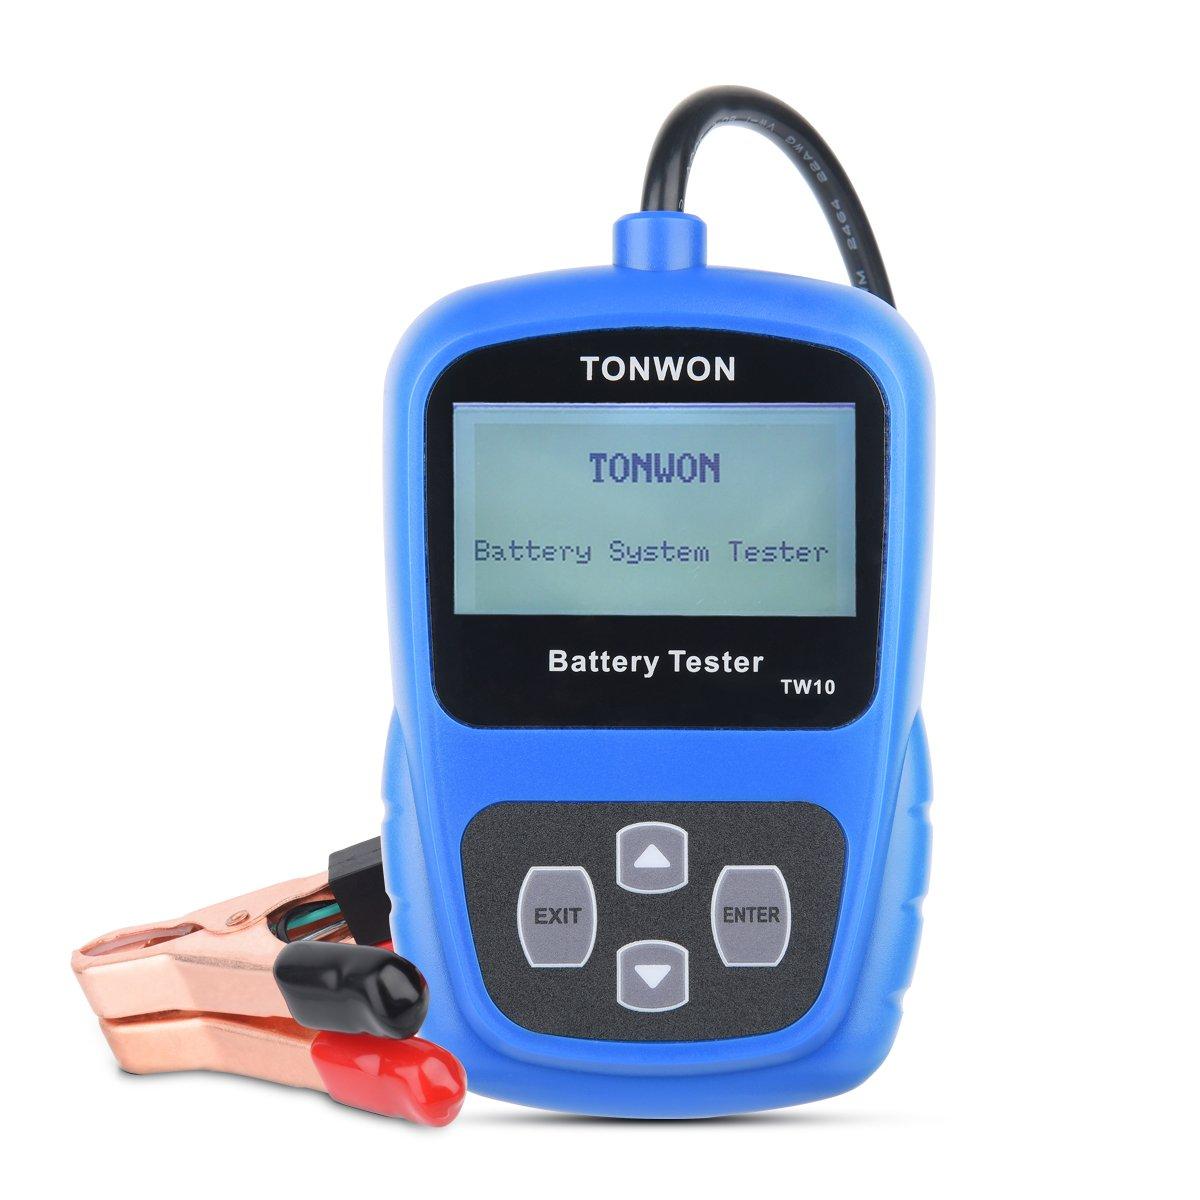 TONWON Battery Tester Automotive Load Battery Tester Car Battery Analyzer on Cranking System, Charging System and Battery System for 12V Car and Light Truck